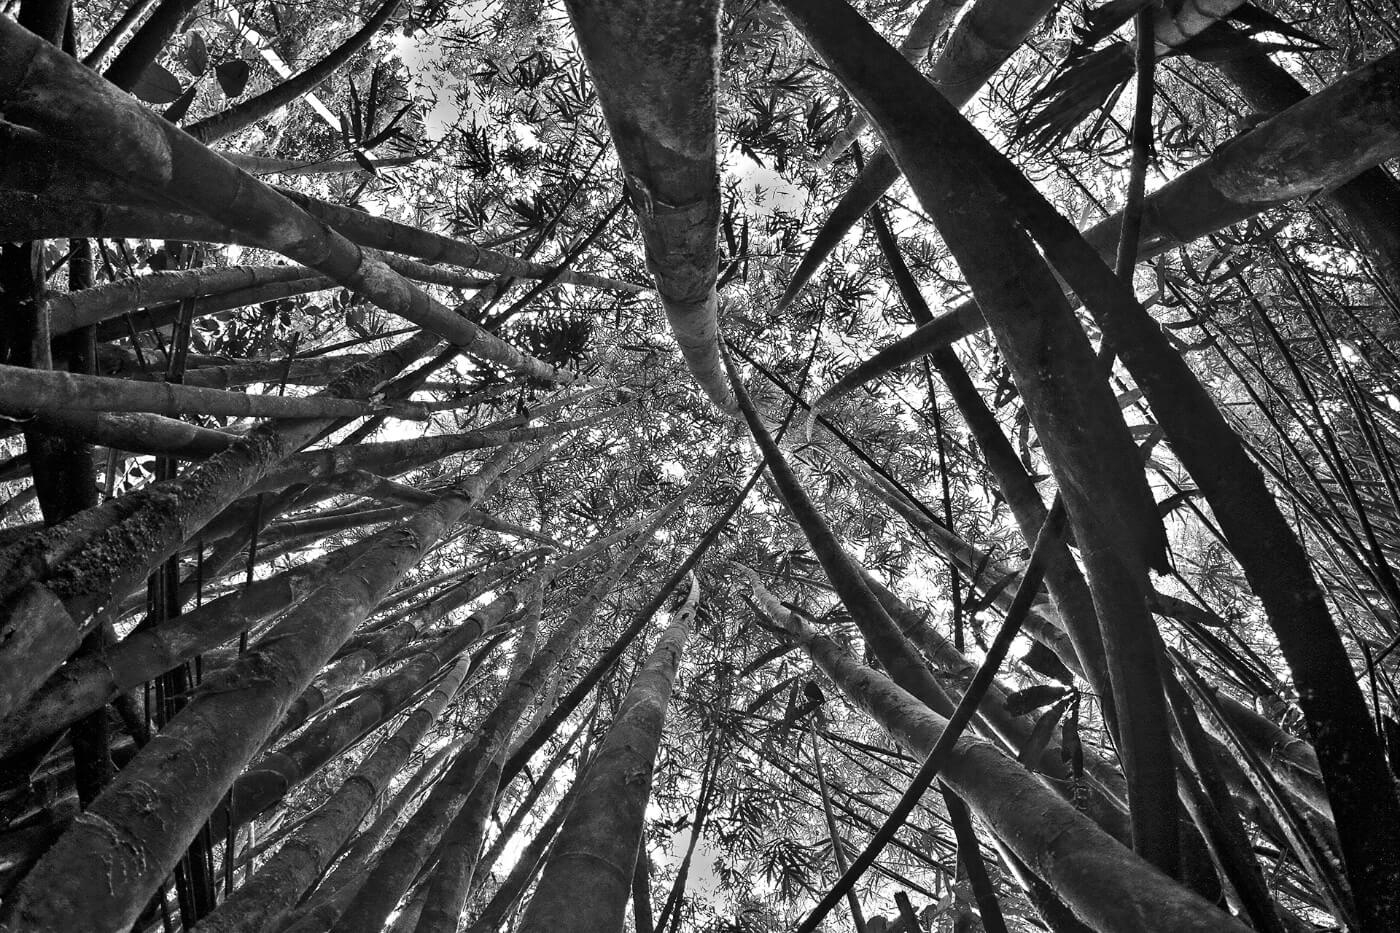 Borneo-Bamboo1400x933 copy 2